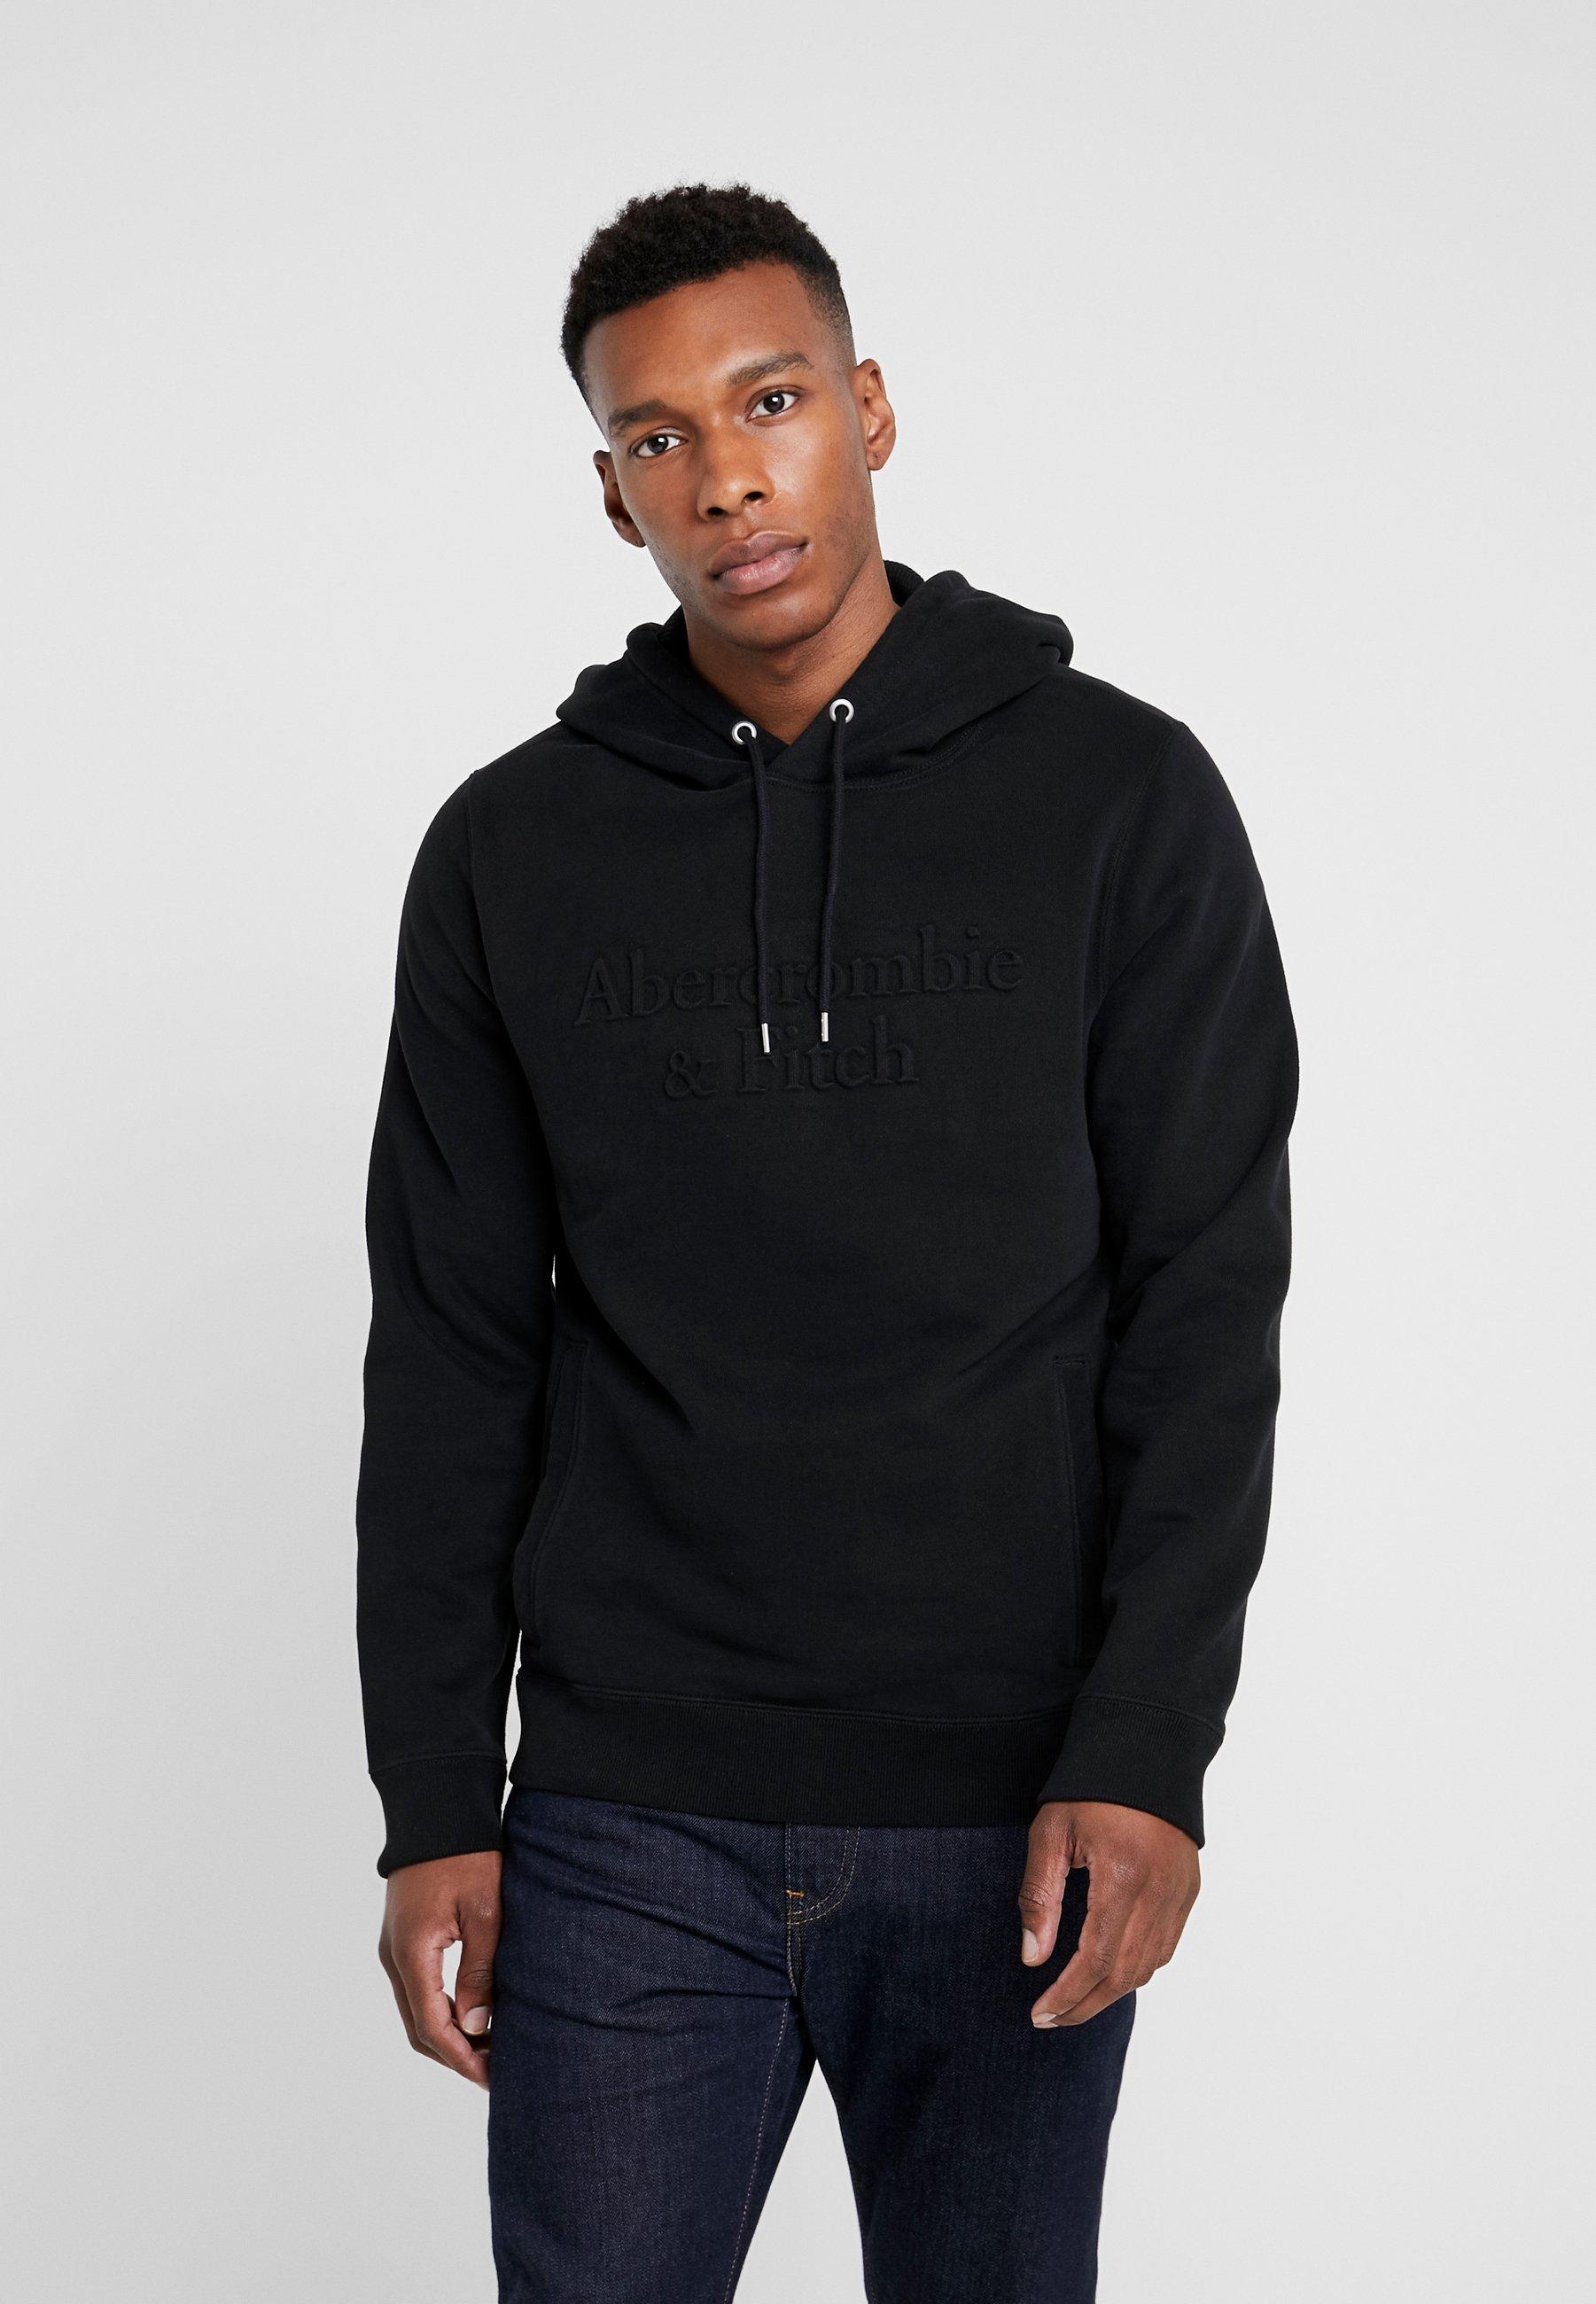 Abercrombie & Fitch EMBOSSED TREND LOGO - Bluza z kapturem - black